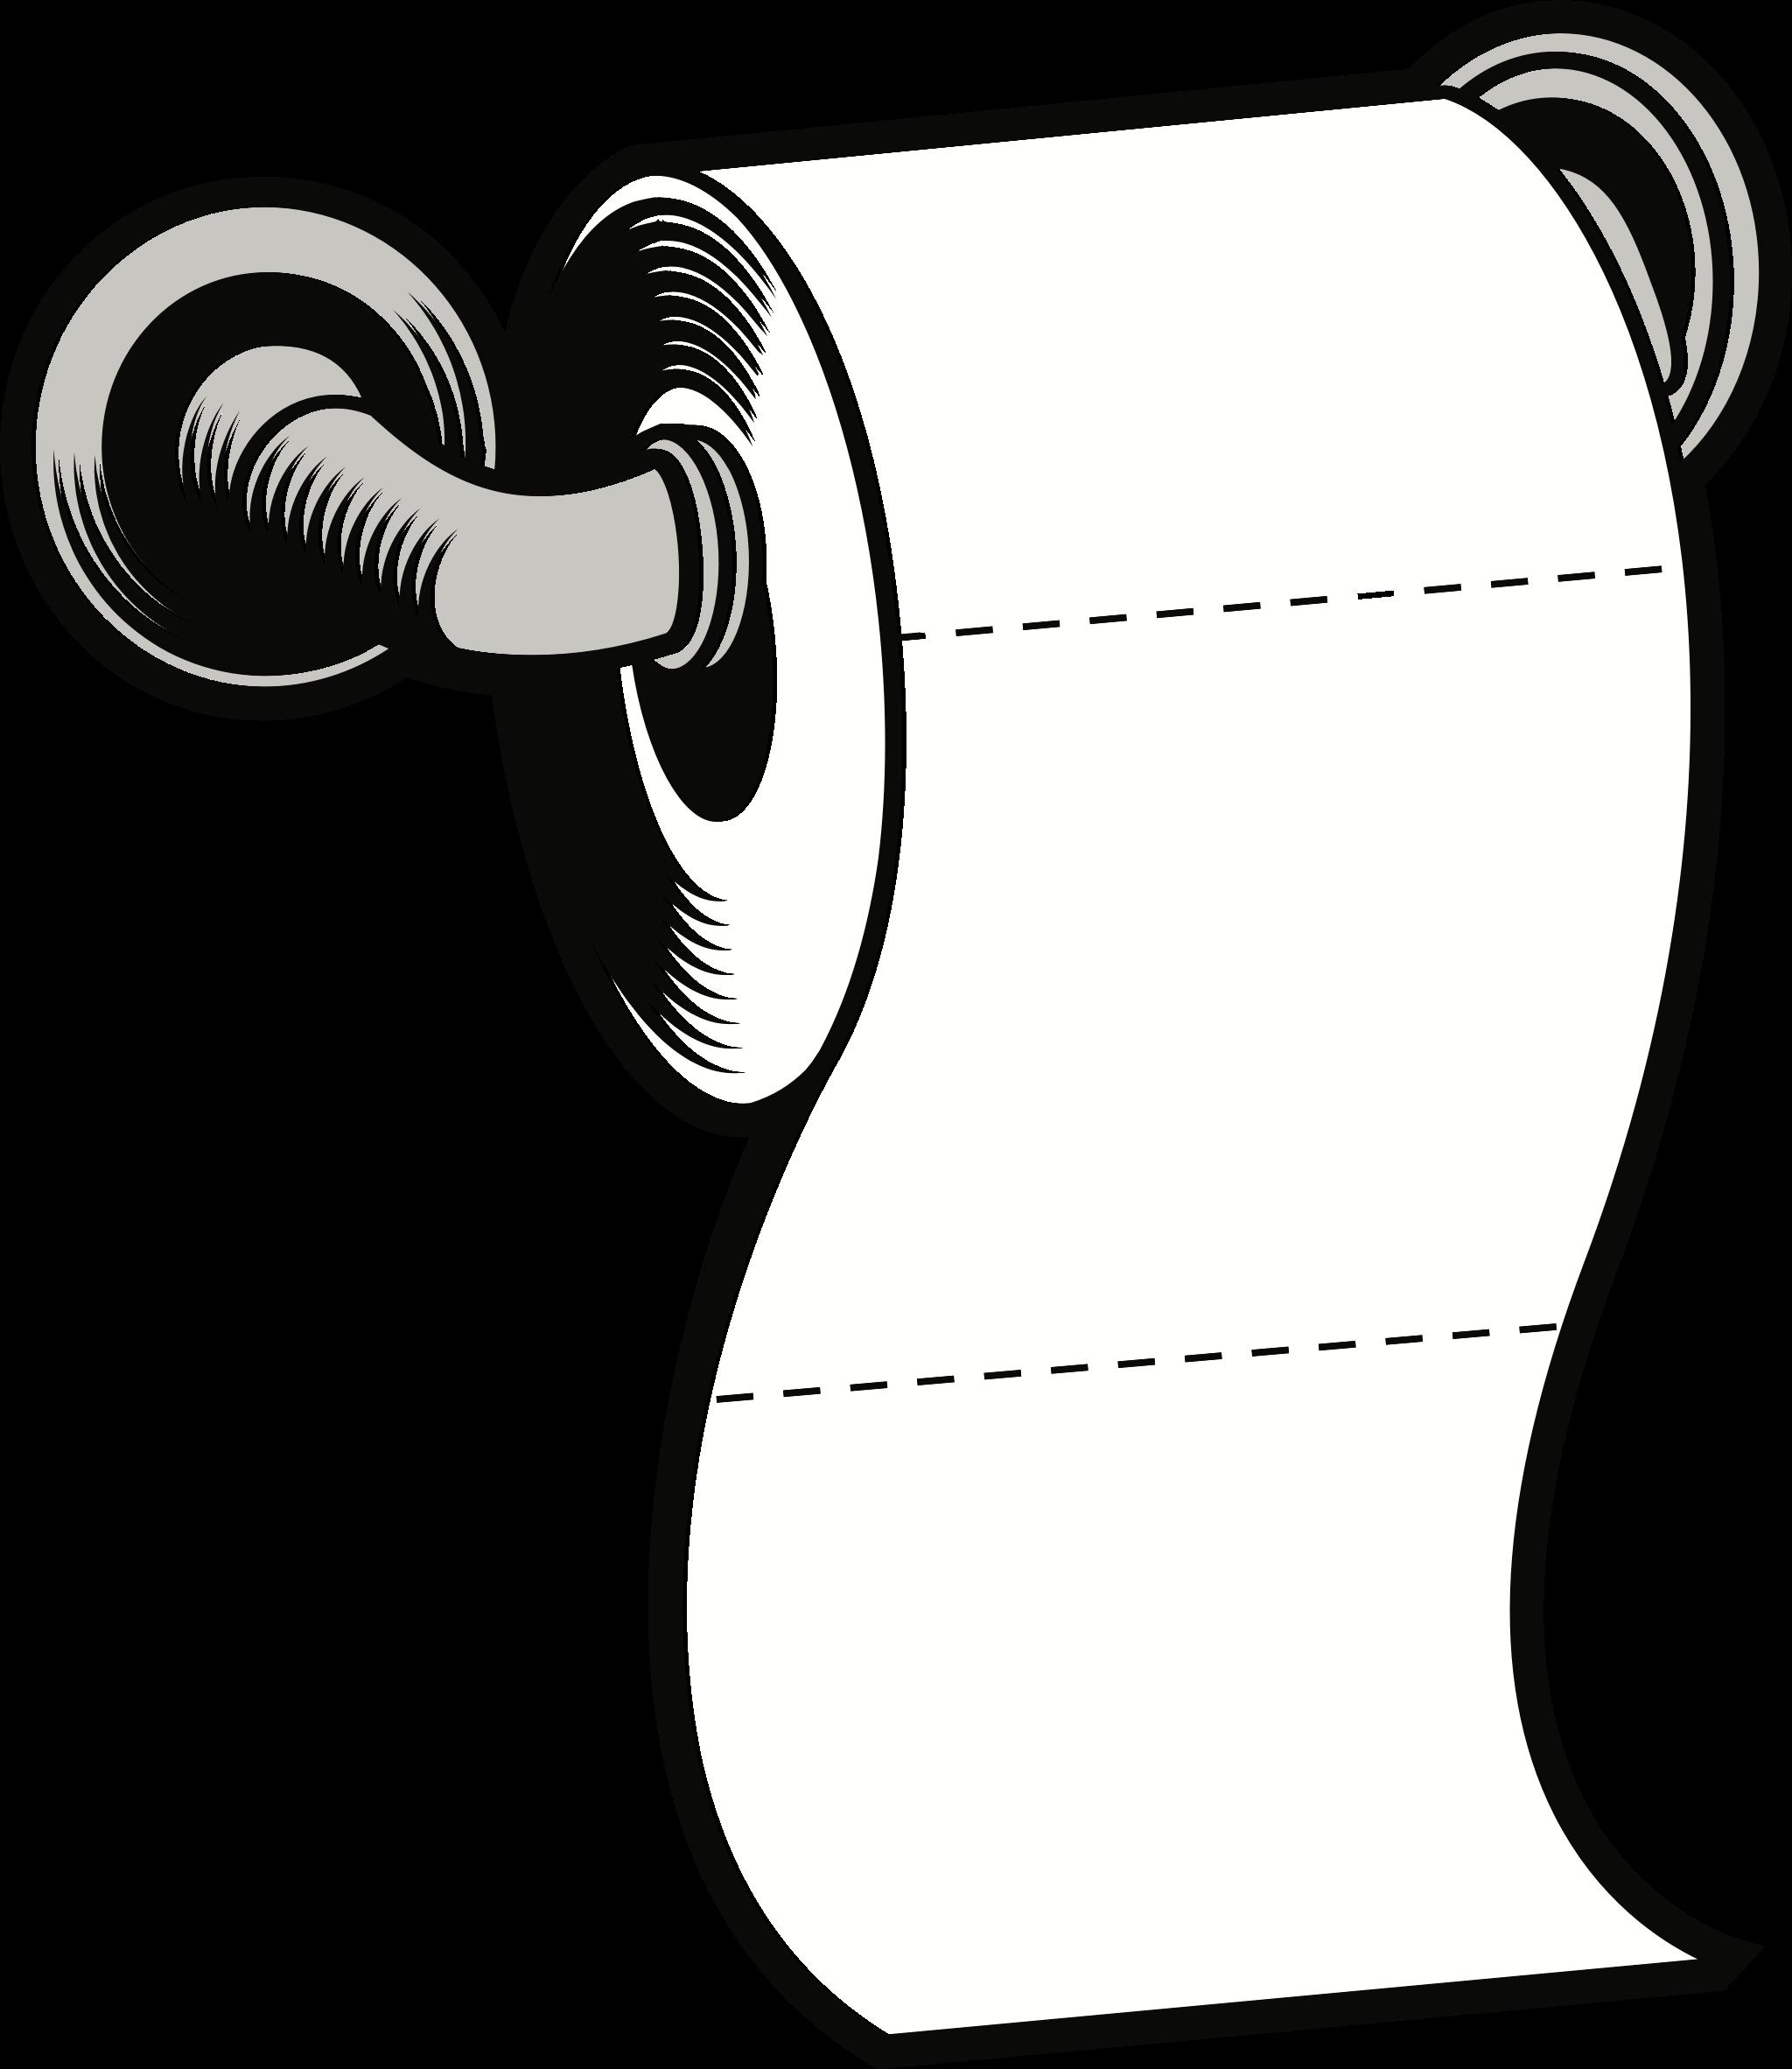 Big image png. Clipart toilet toilet paper